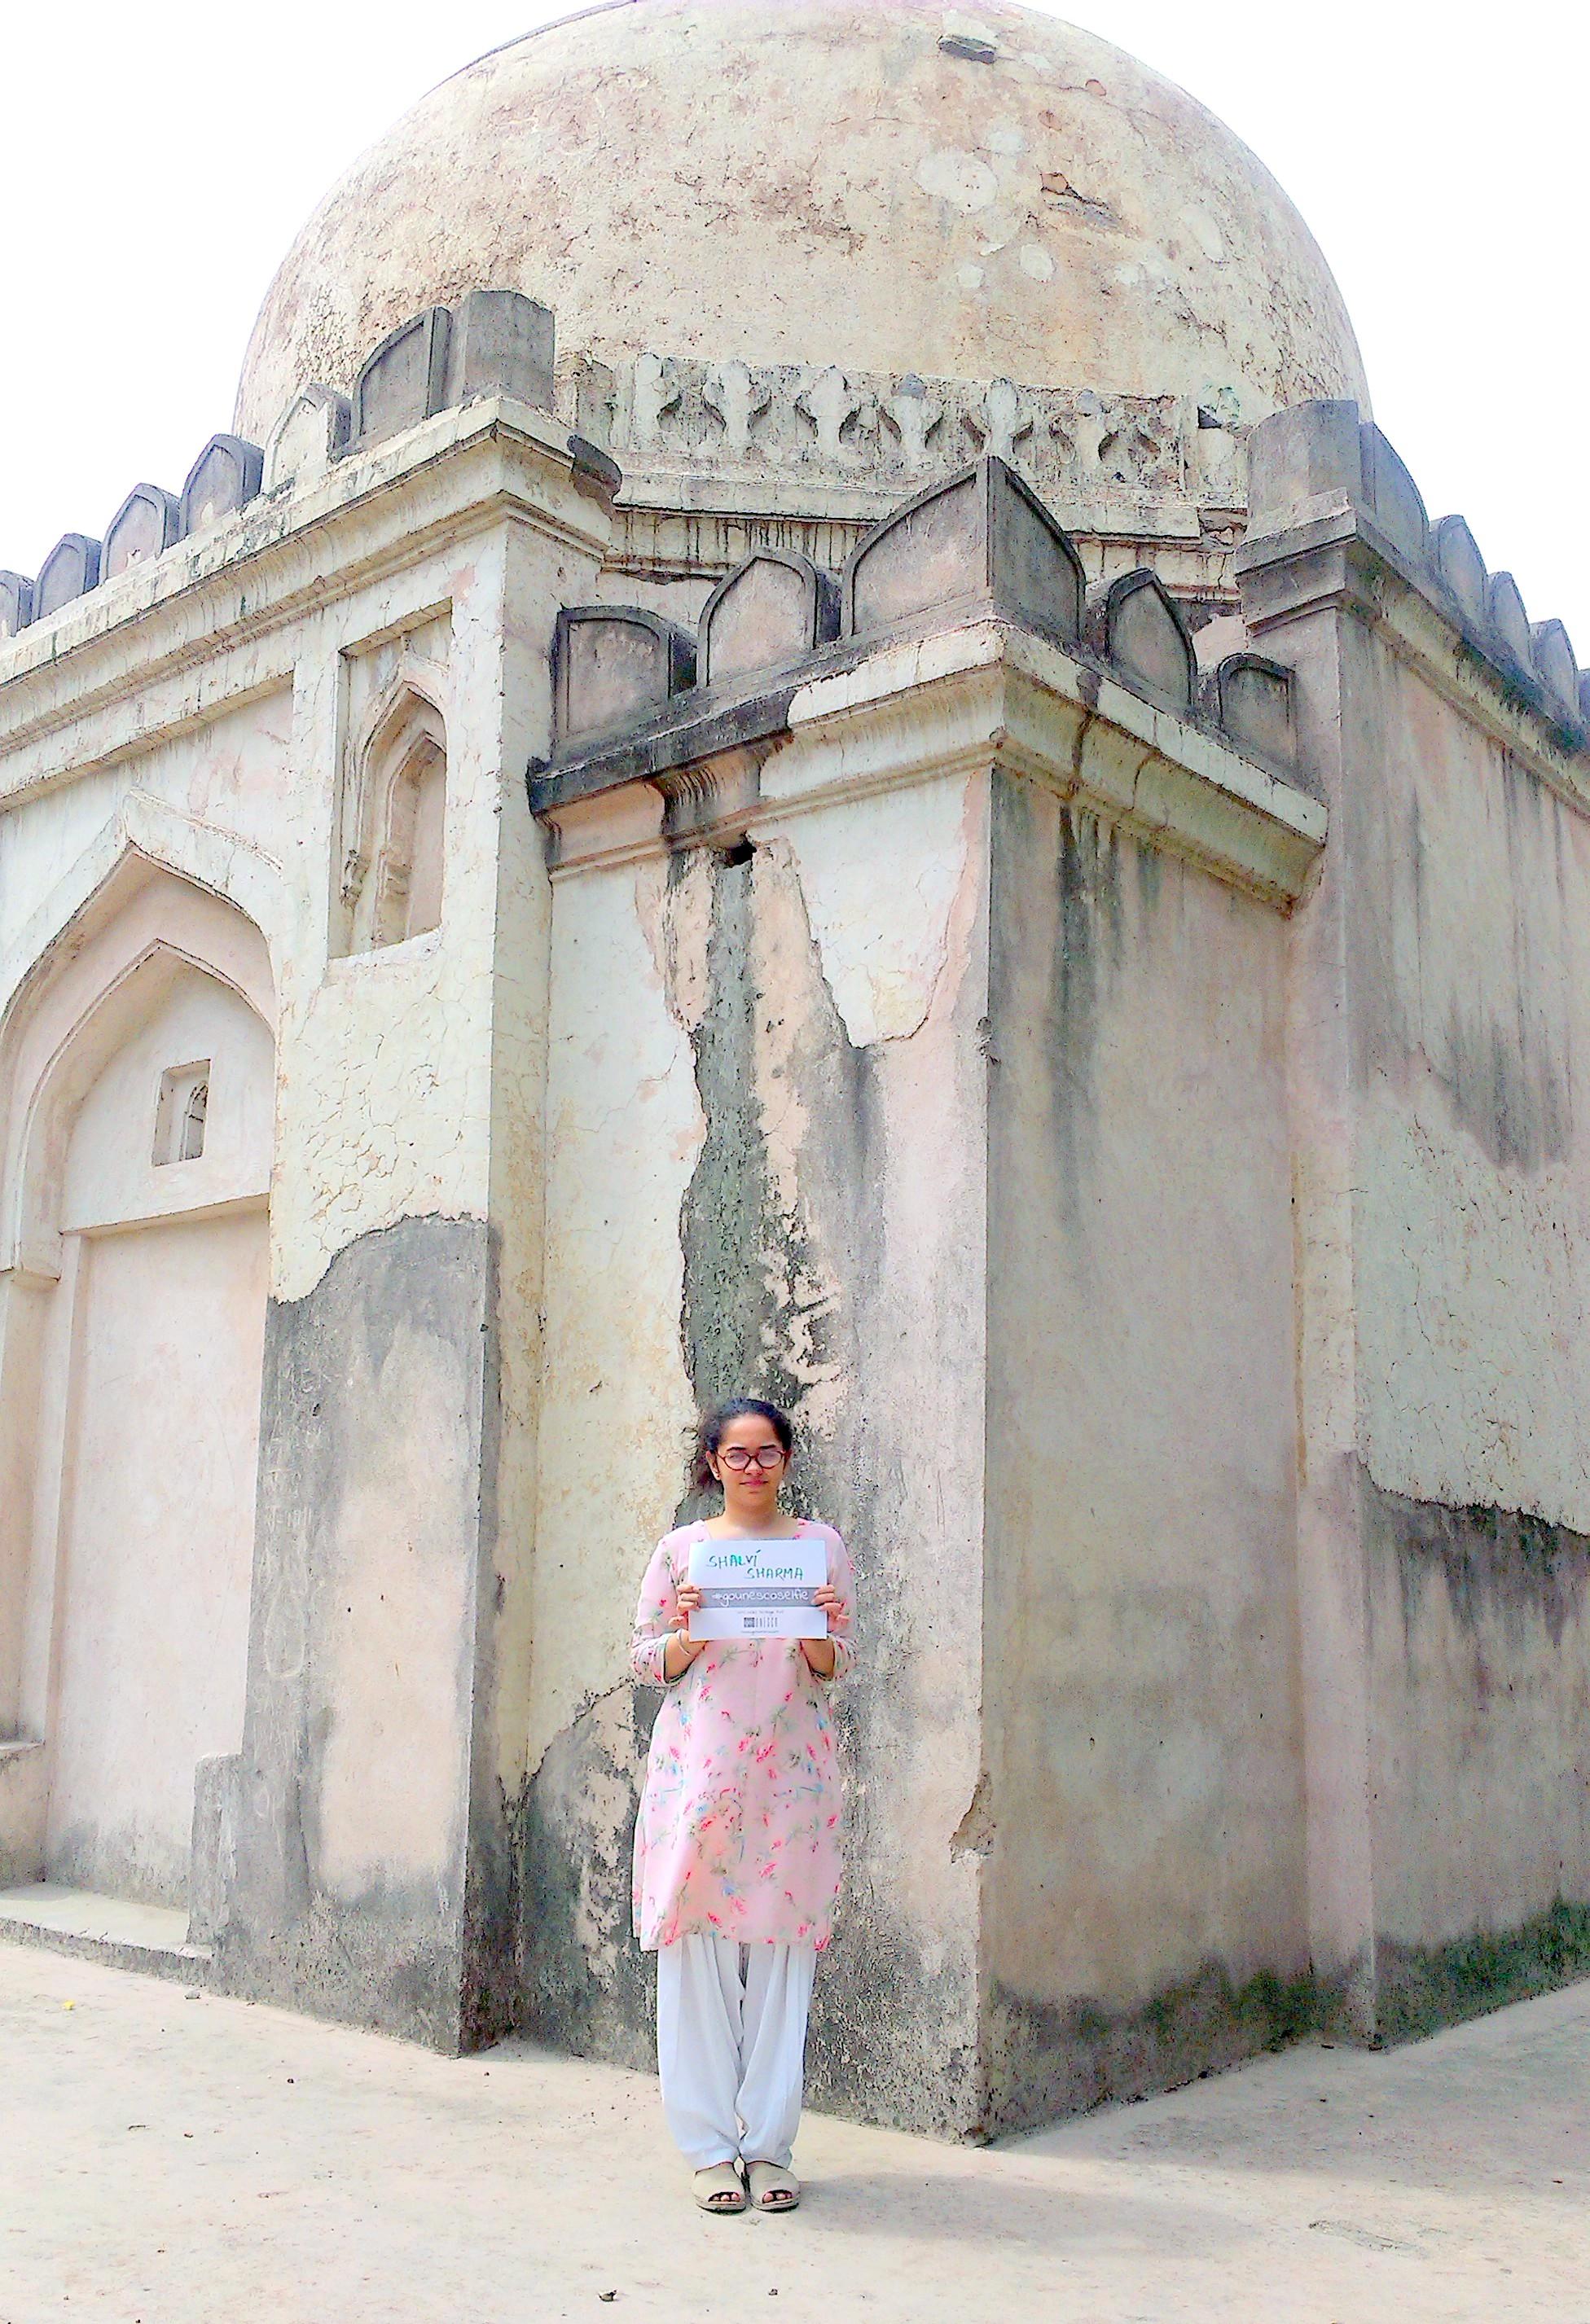 Choti Gumti Hauz Khas Ruins